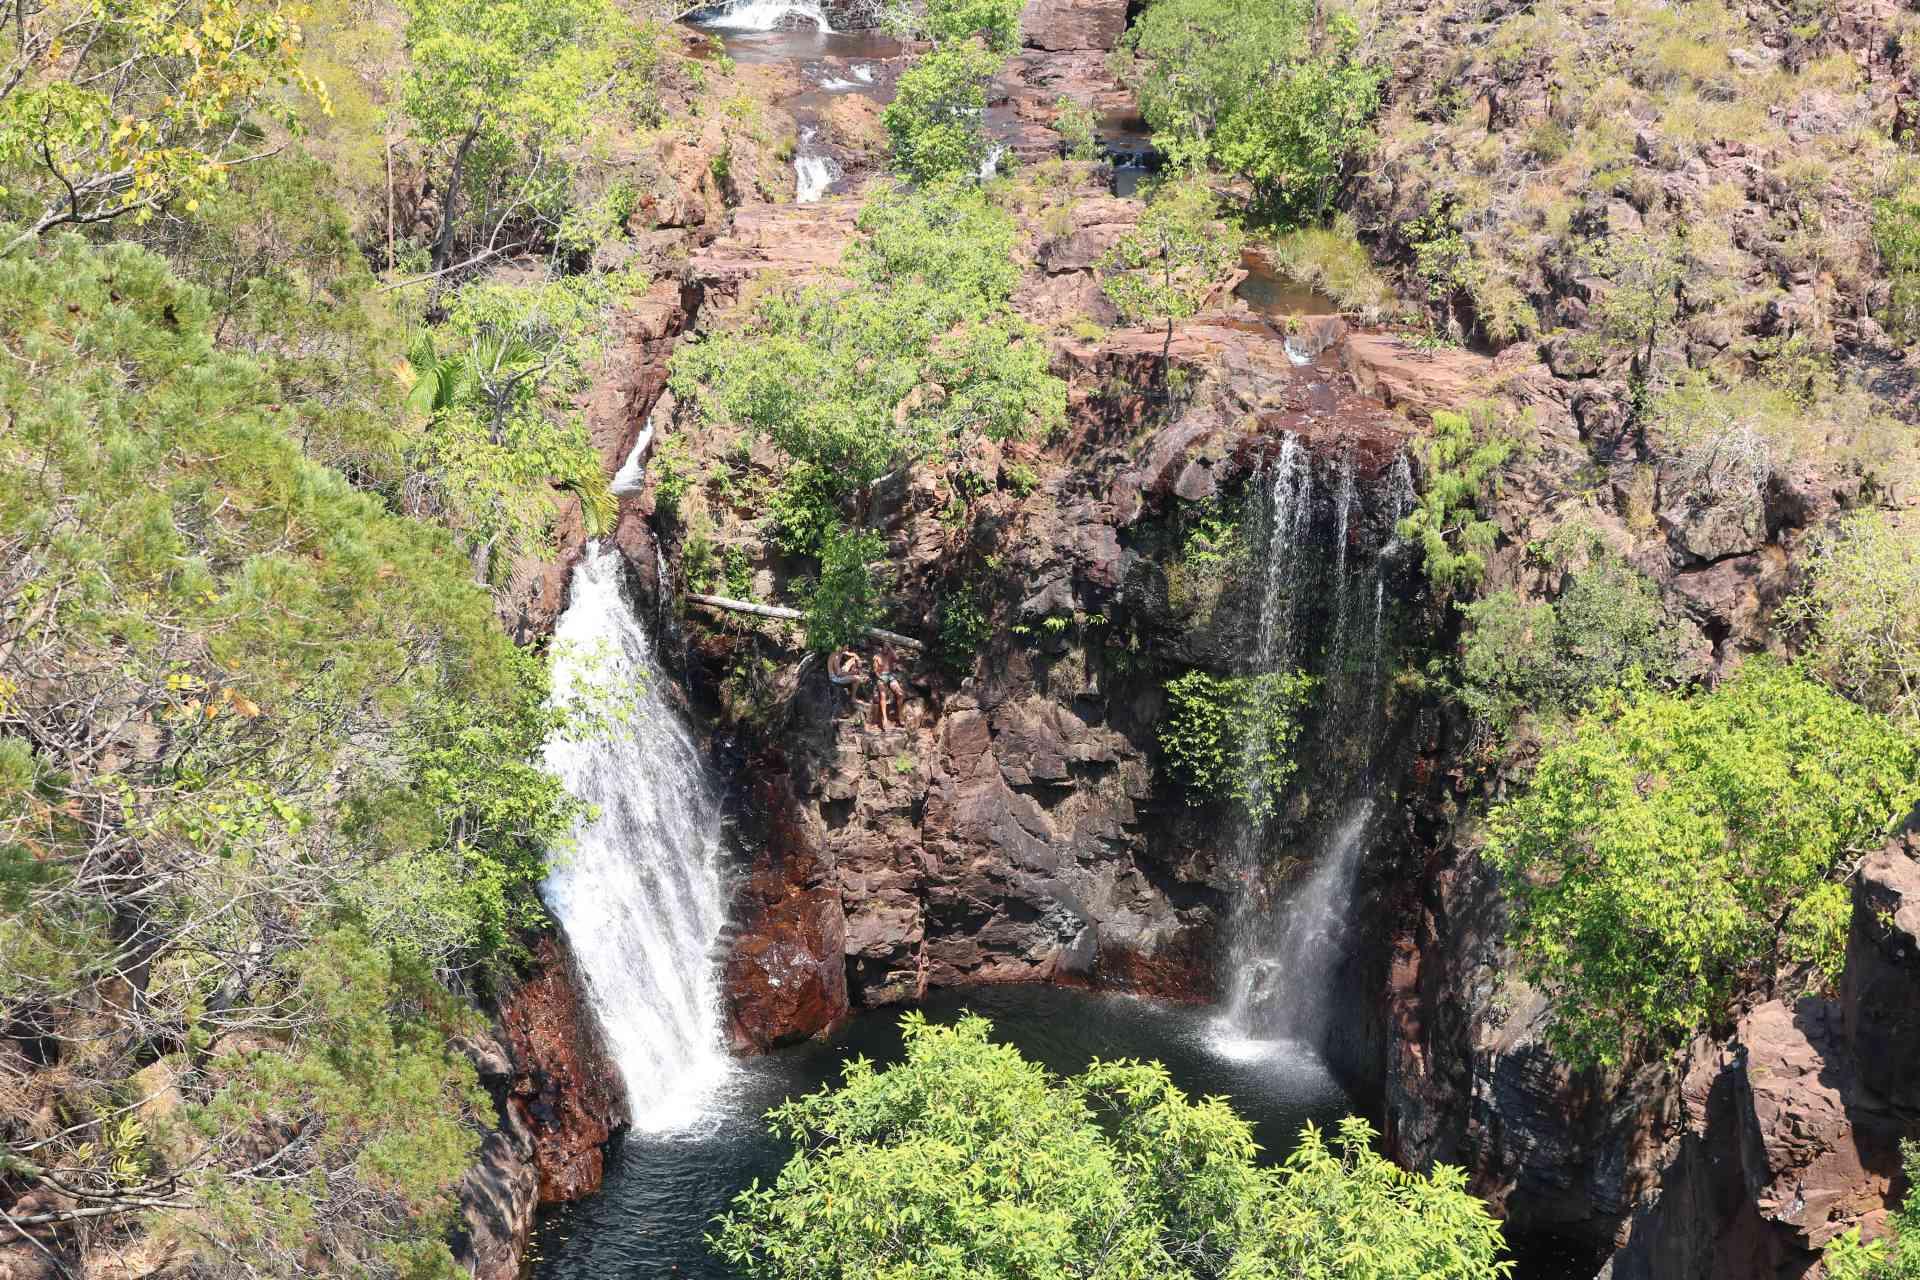 Karrimurra (Florence Falls) in Litchfield National Park, Northern Territory, Australia by Kristi Rutten